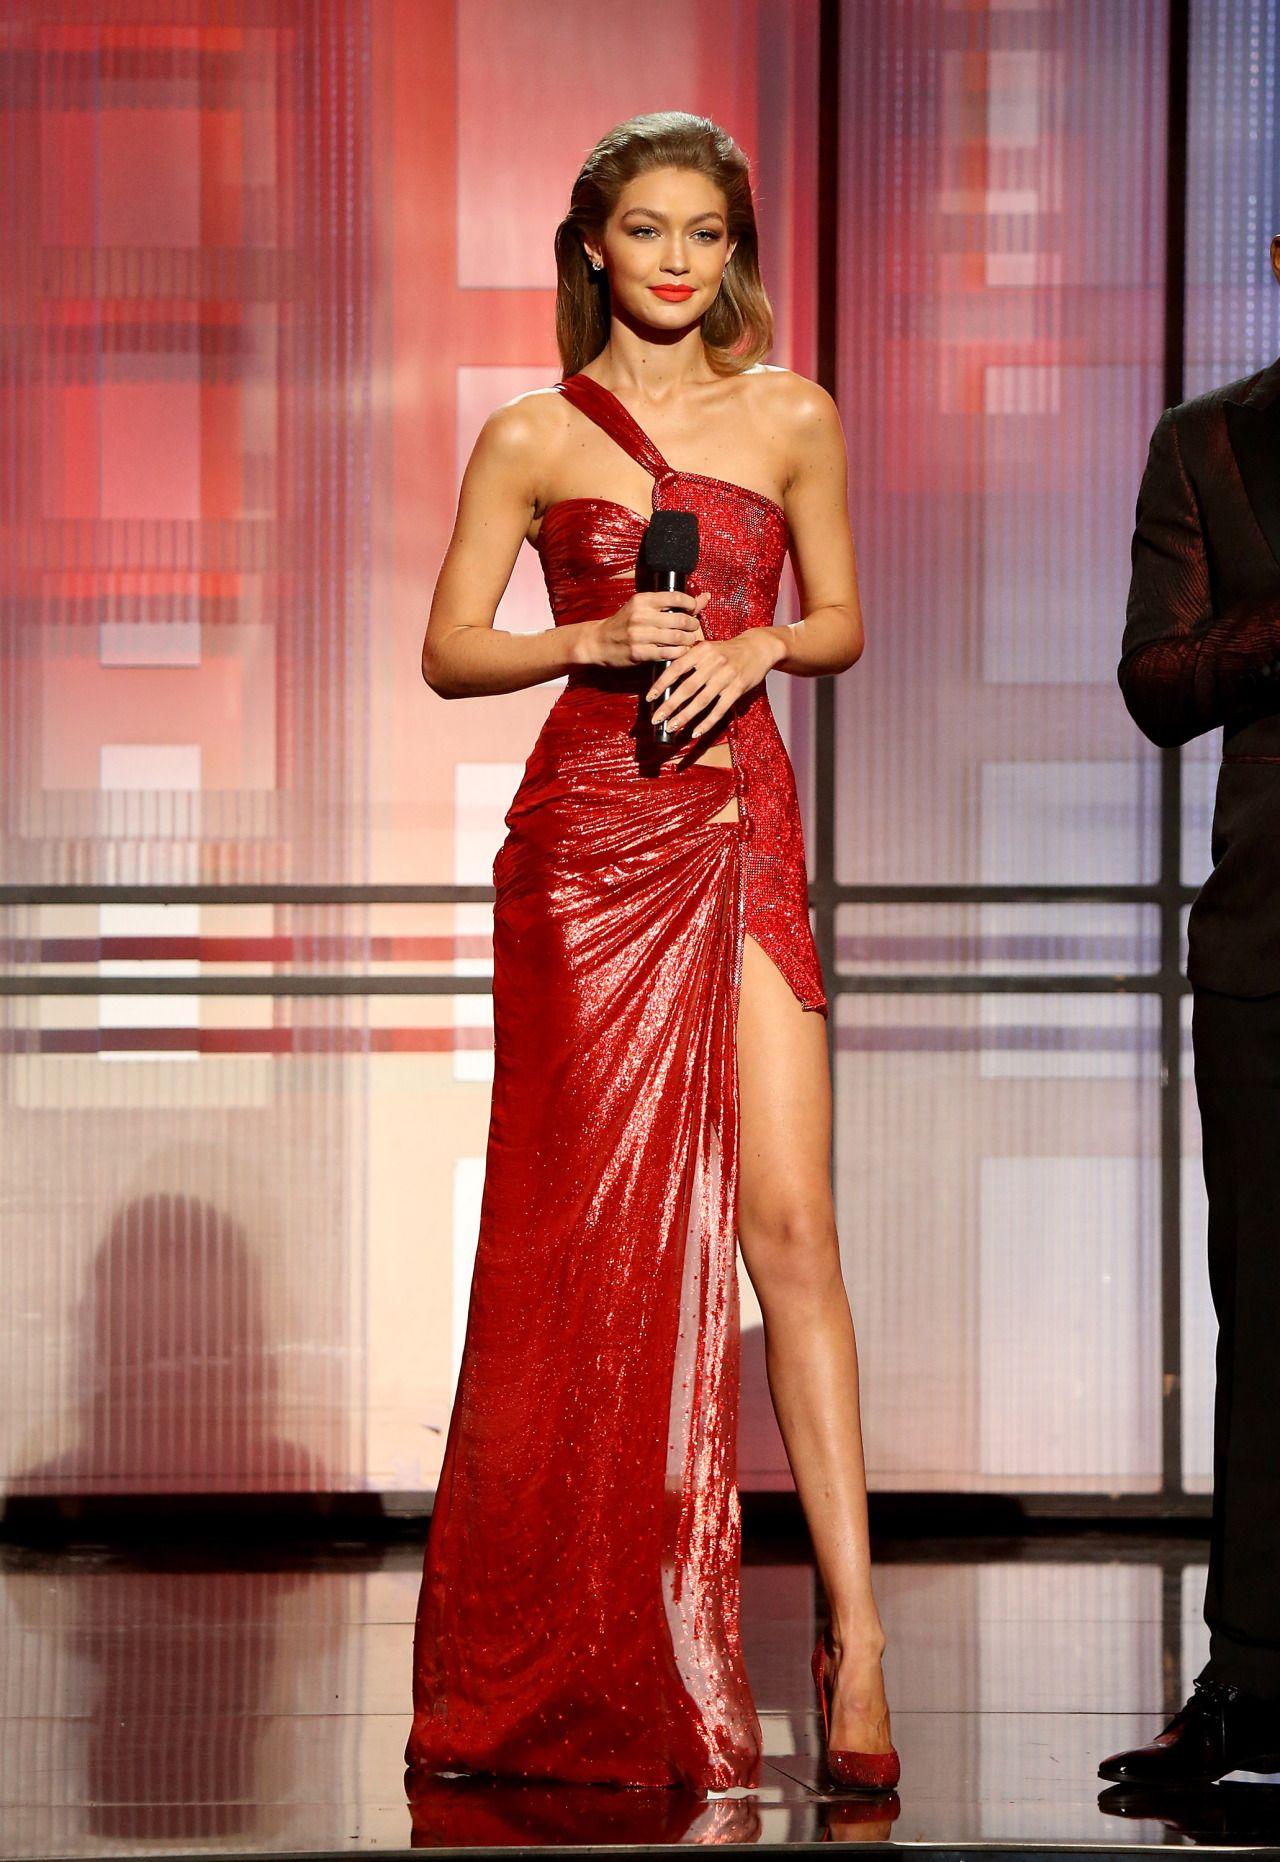 Gigi Hadid Gigi Hadid Outfits Nice Dresses Hadid Style [ 1862 x 1280 Pixel ]